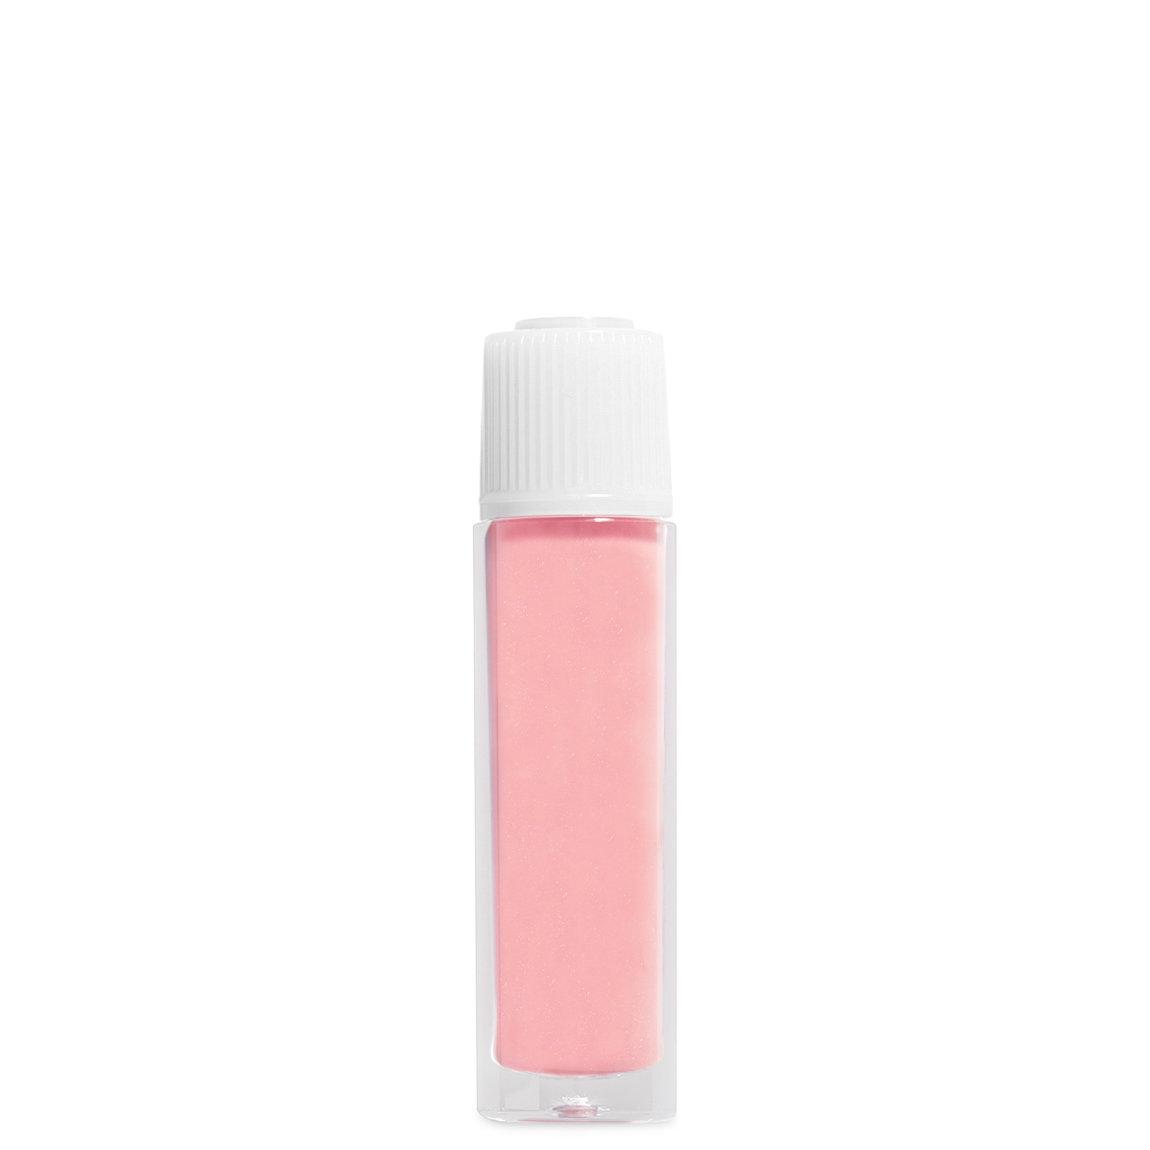 Kjaer Weis Lip Gloss Refill Cherish alternative view 1.